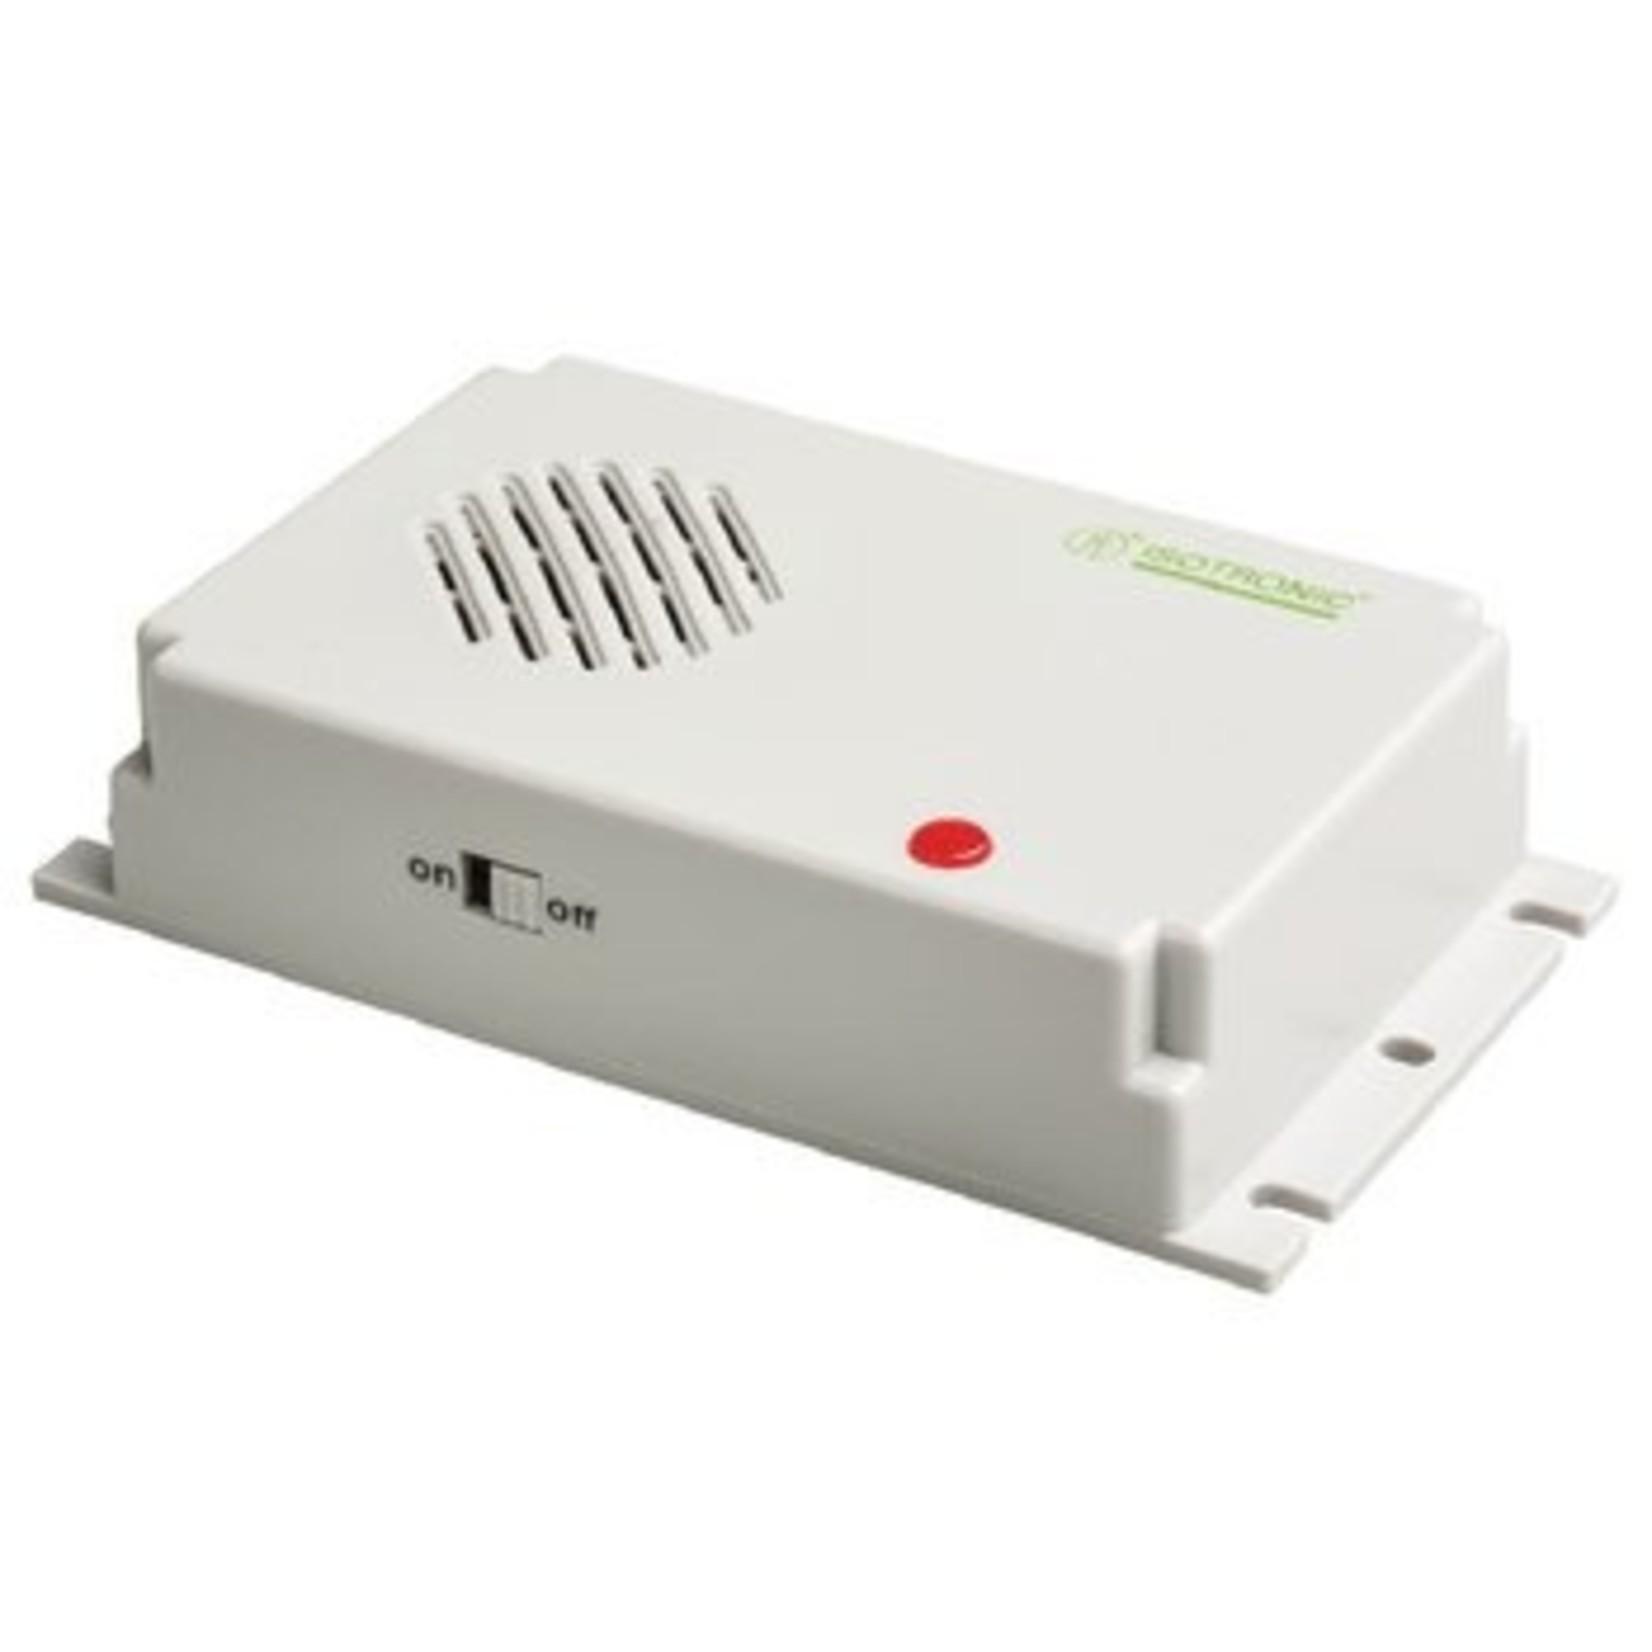 Isotronic Muizen- en rattenverjager op batterijen